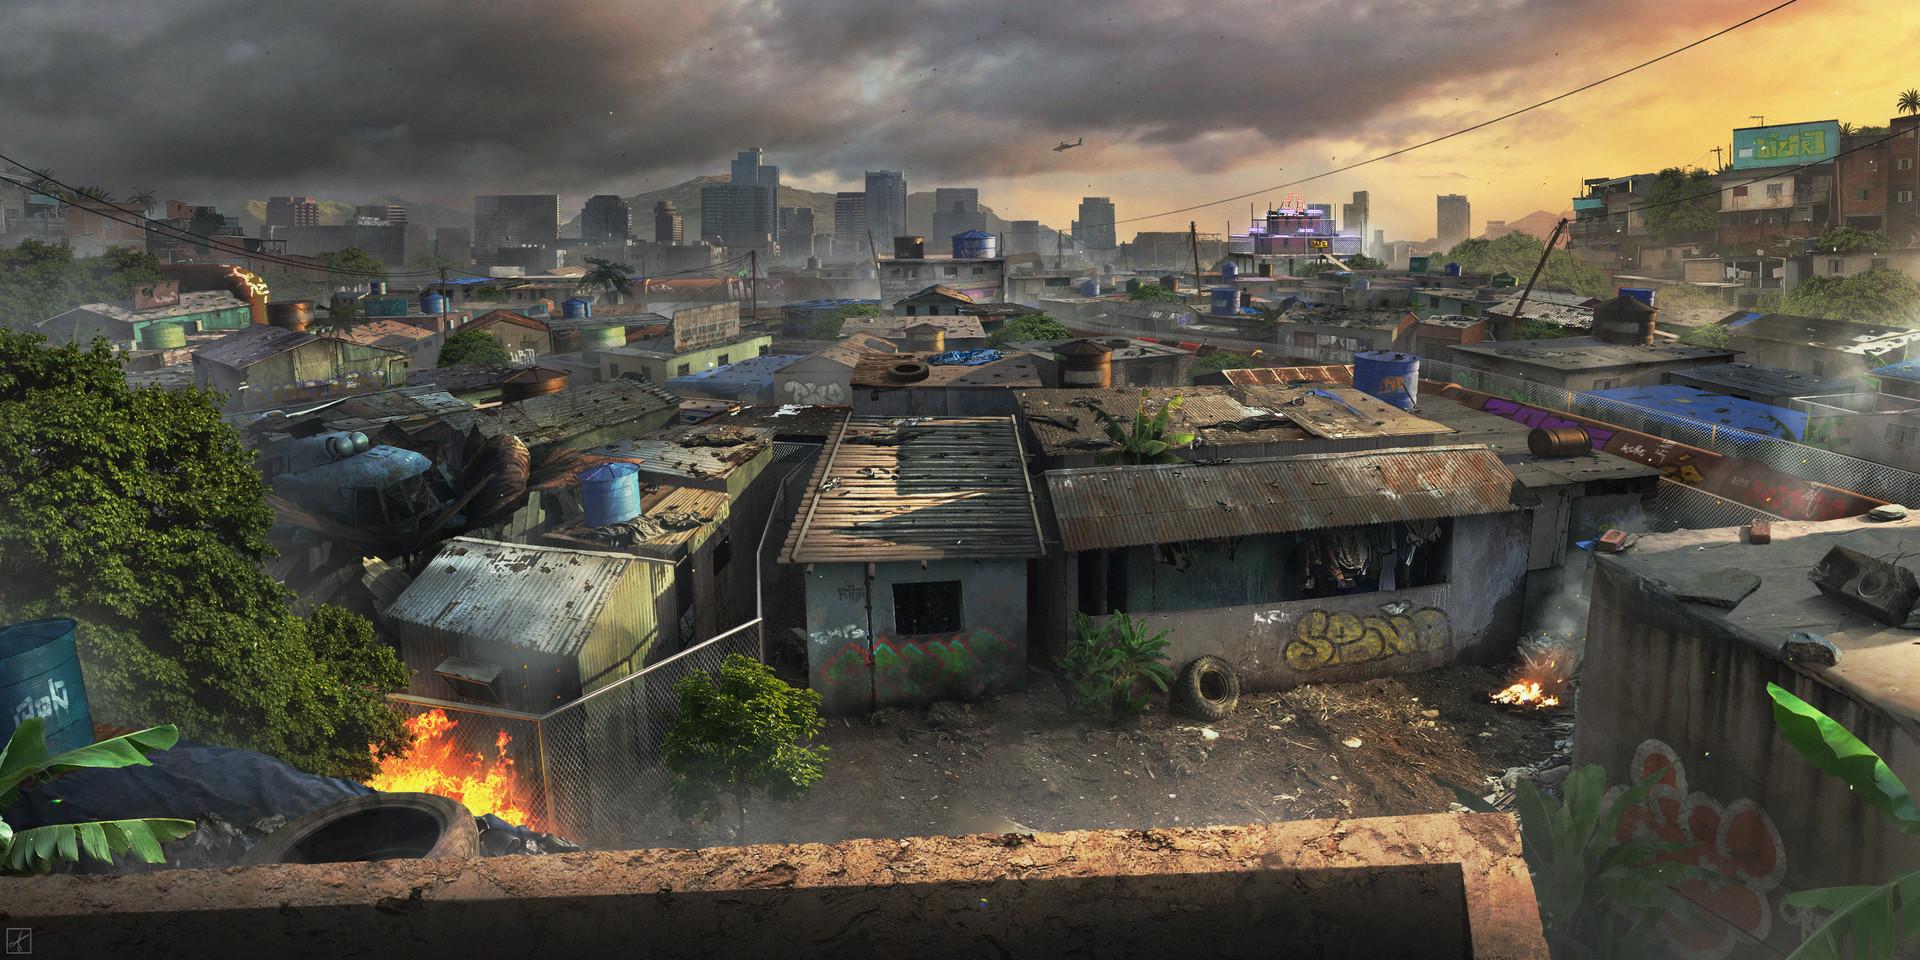 Pavel proskurin favela